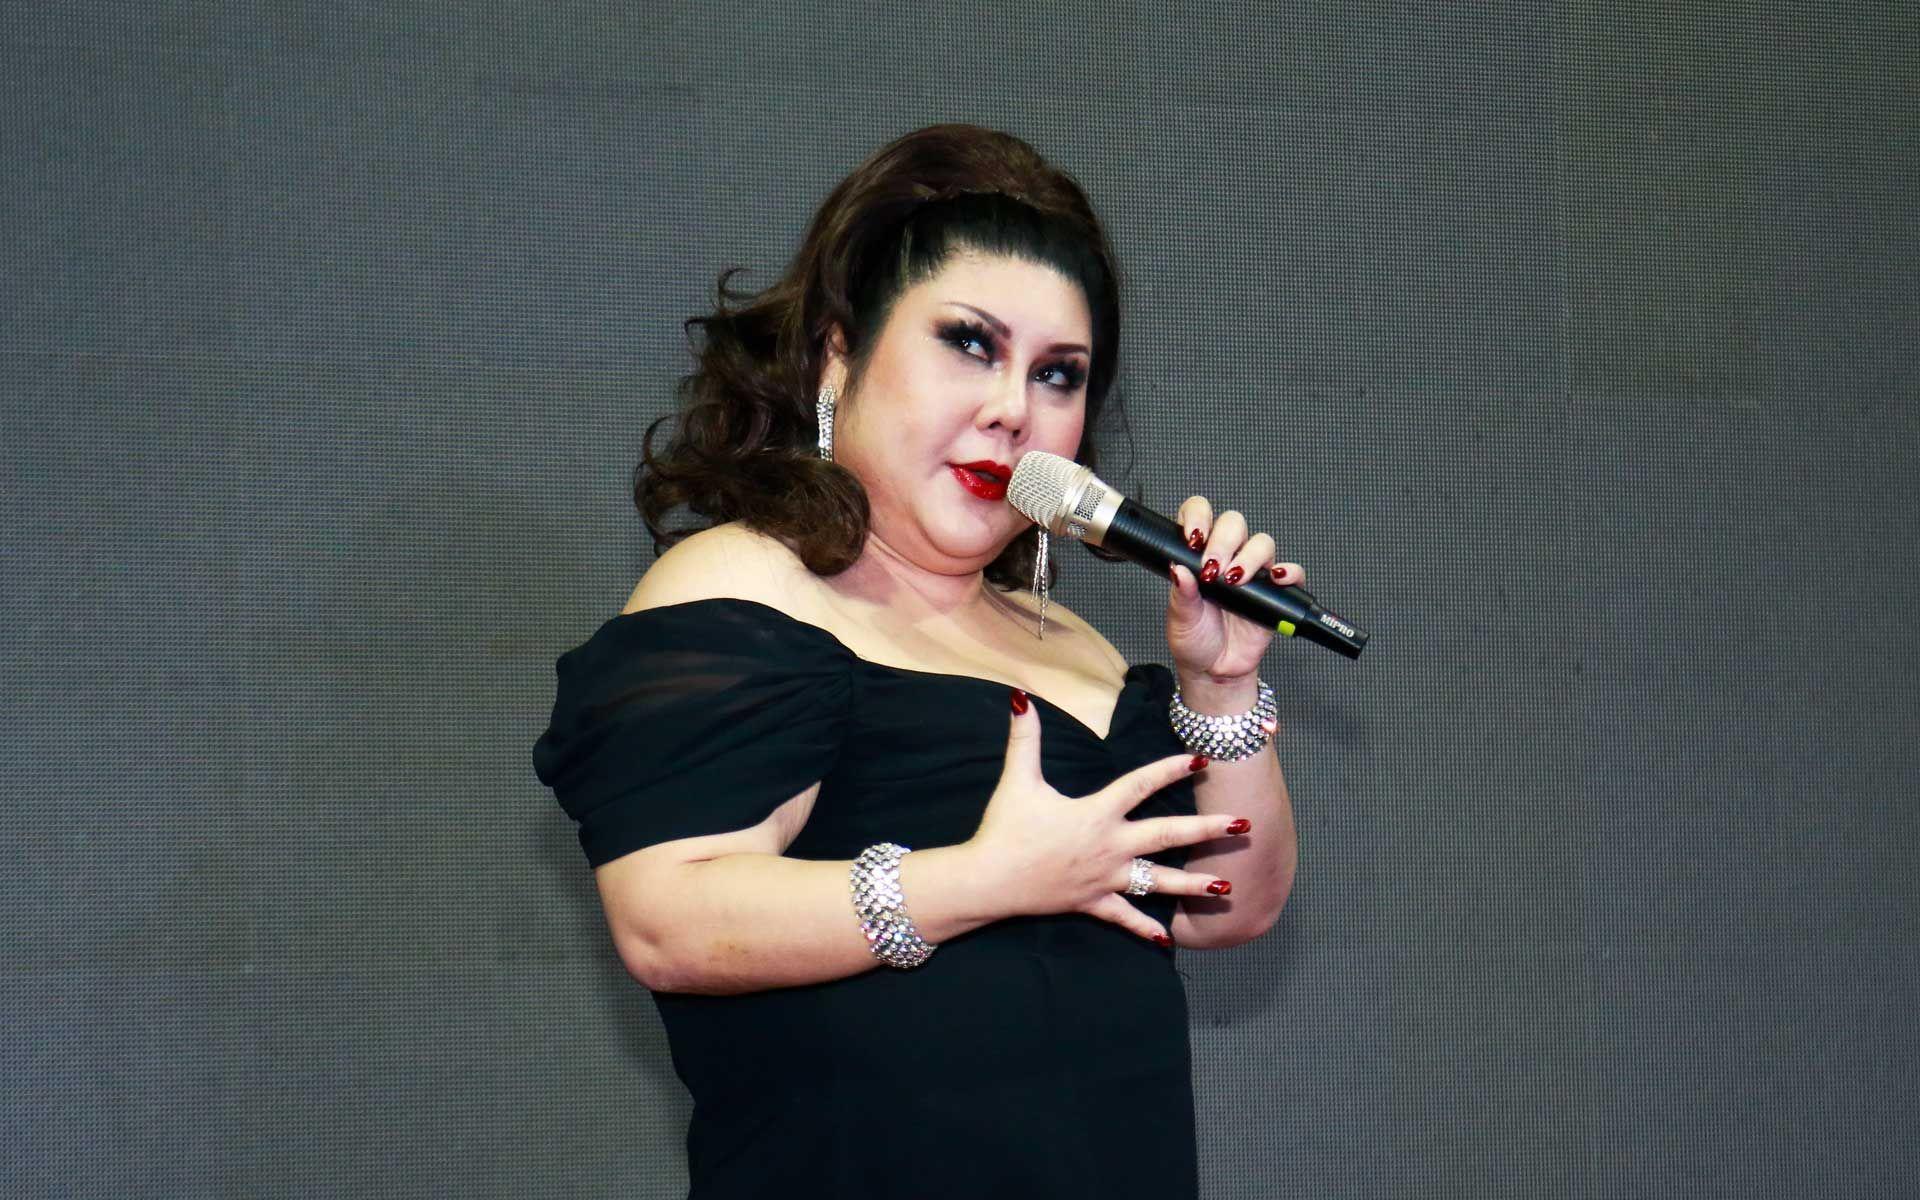 Joanne Kam